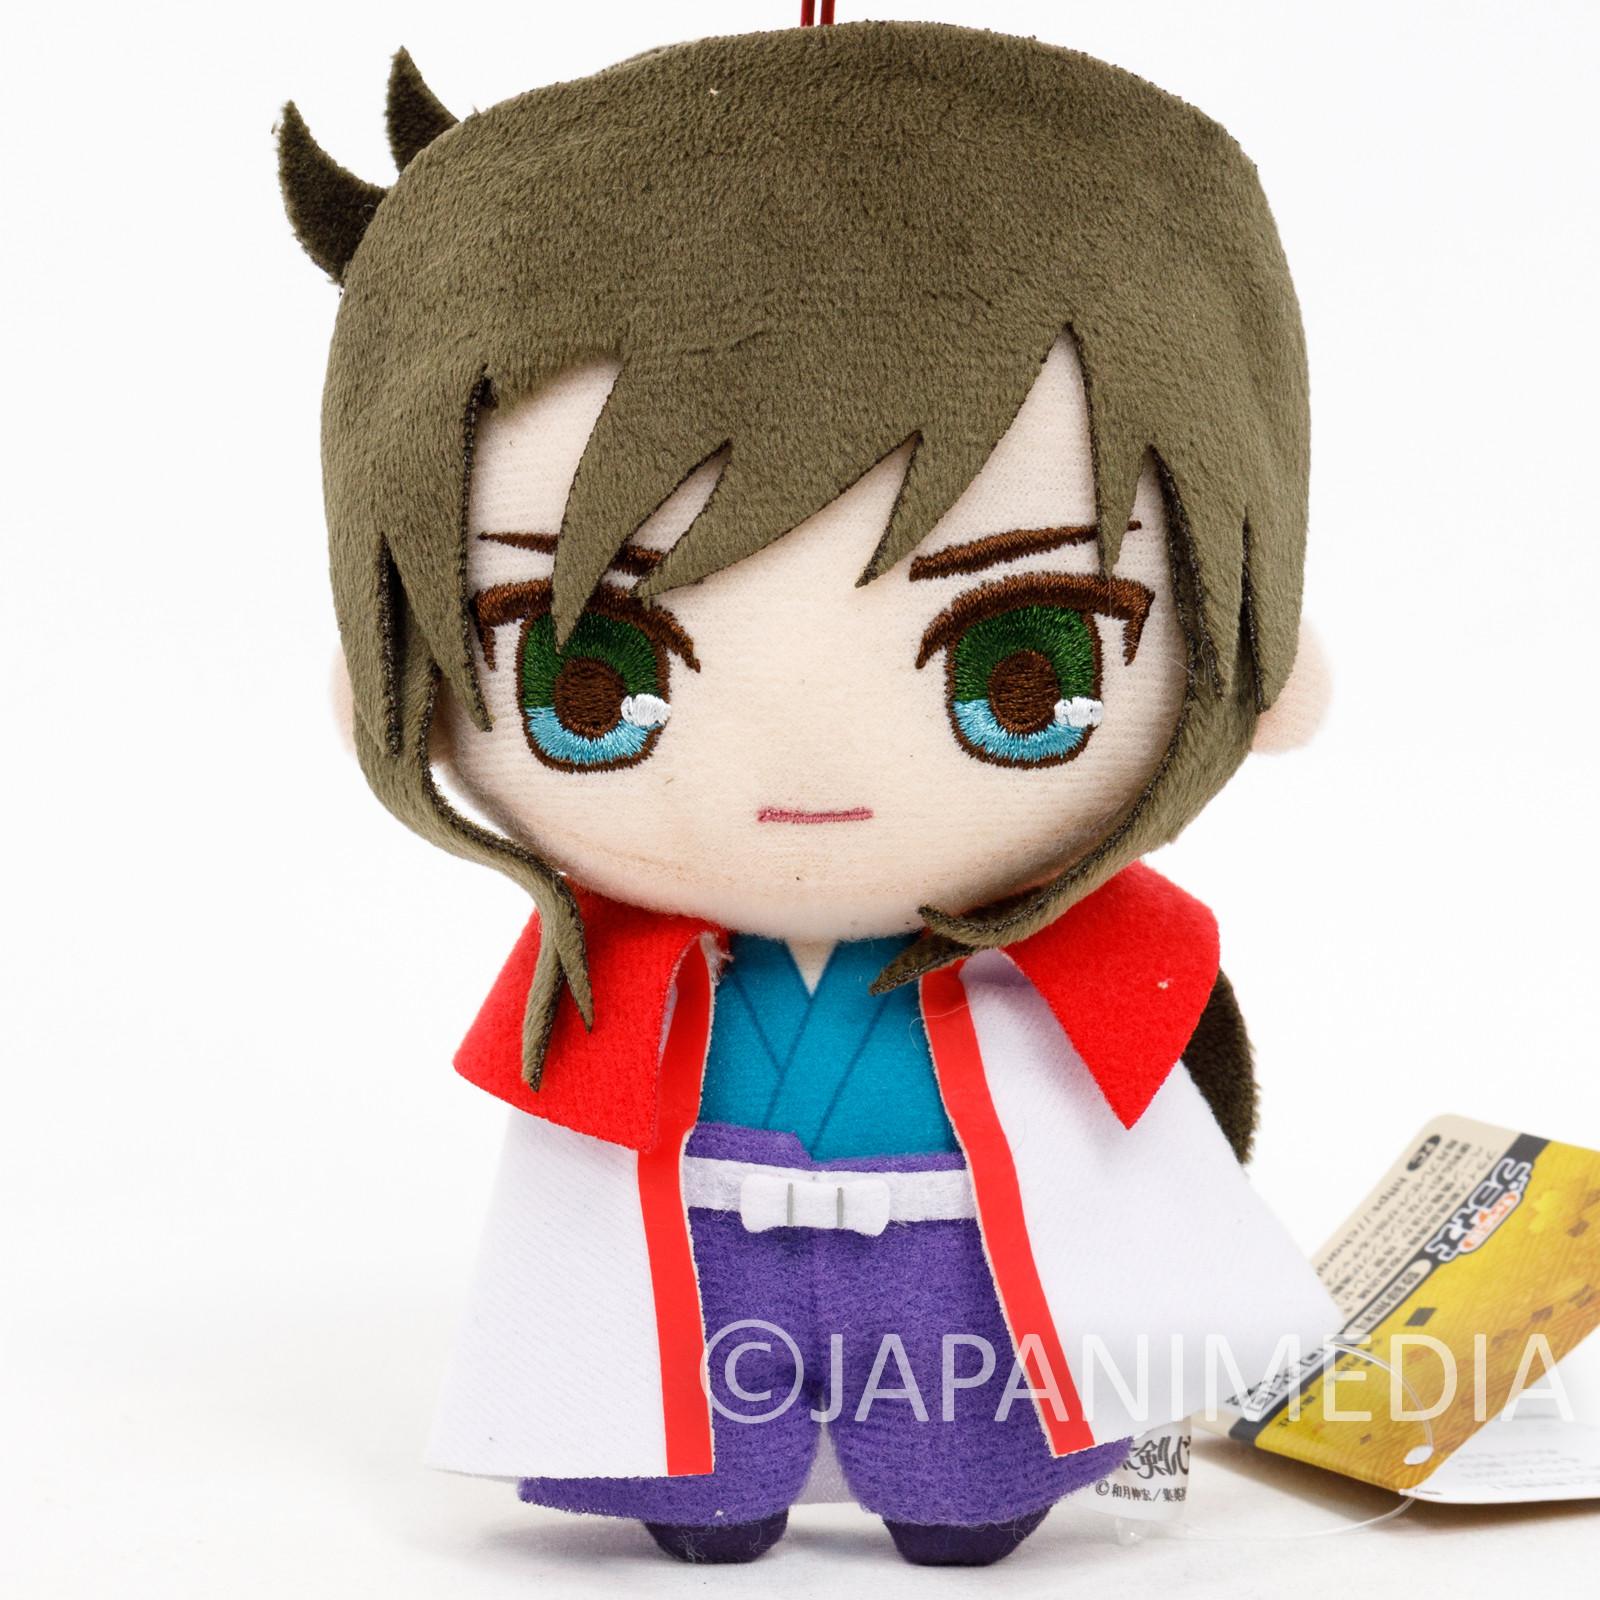 Rurouni Kenshin Seijuro Hiko Plush Doll w/Strap JAPAN ANIME